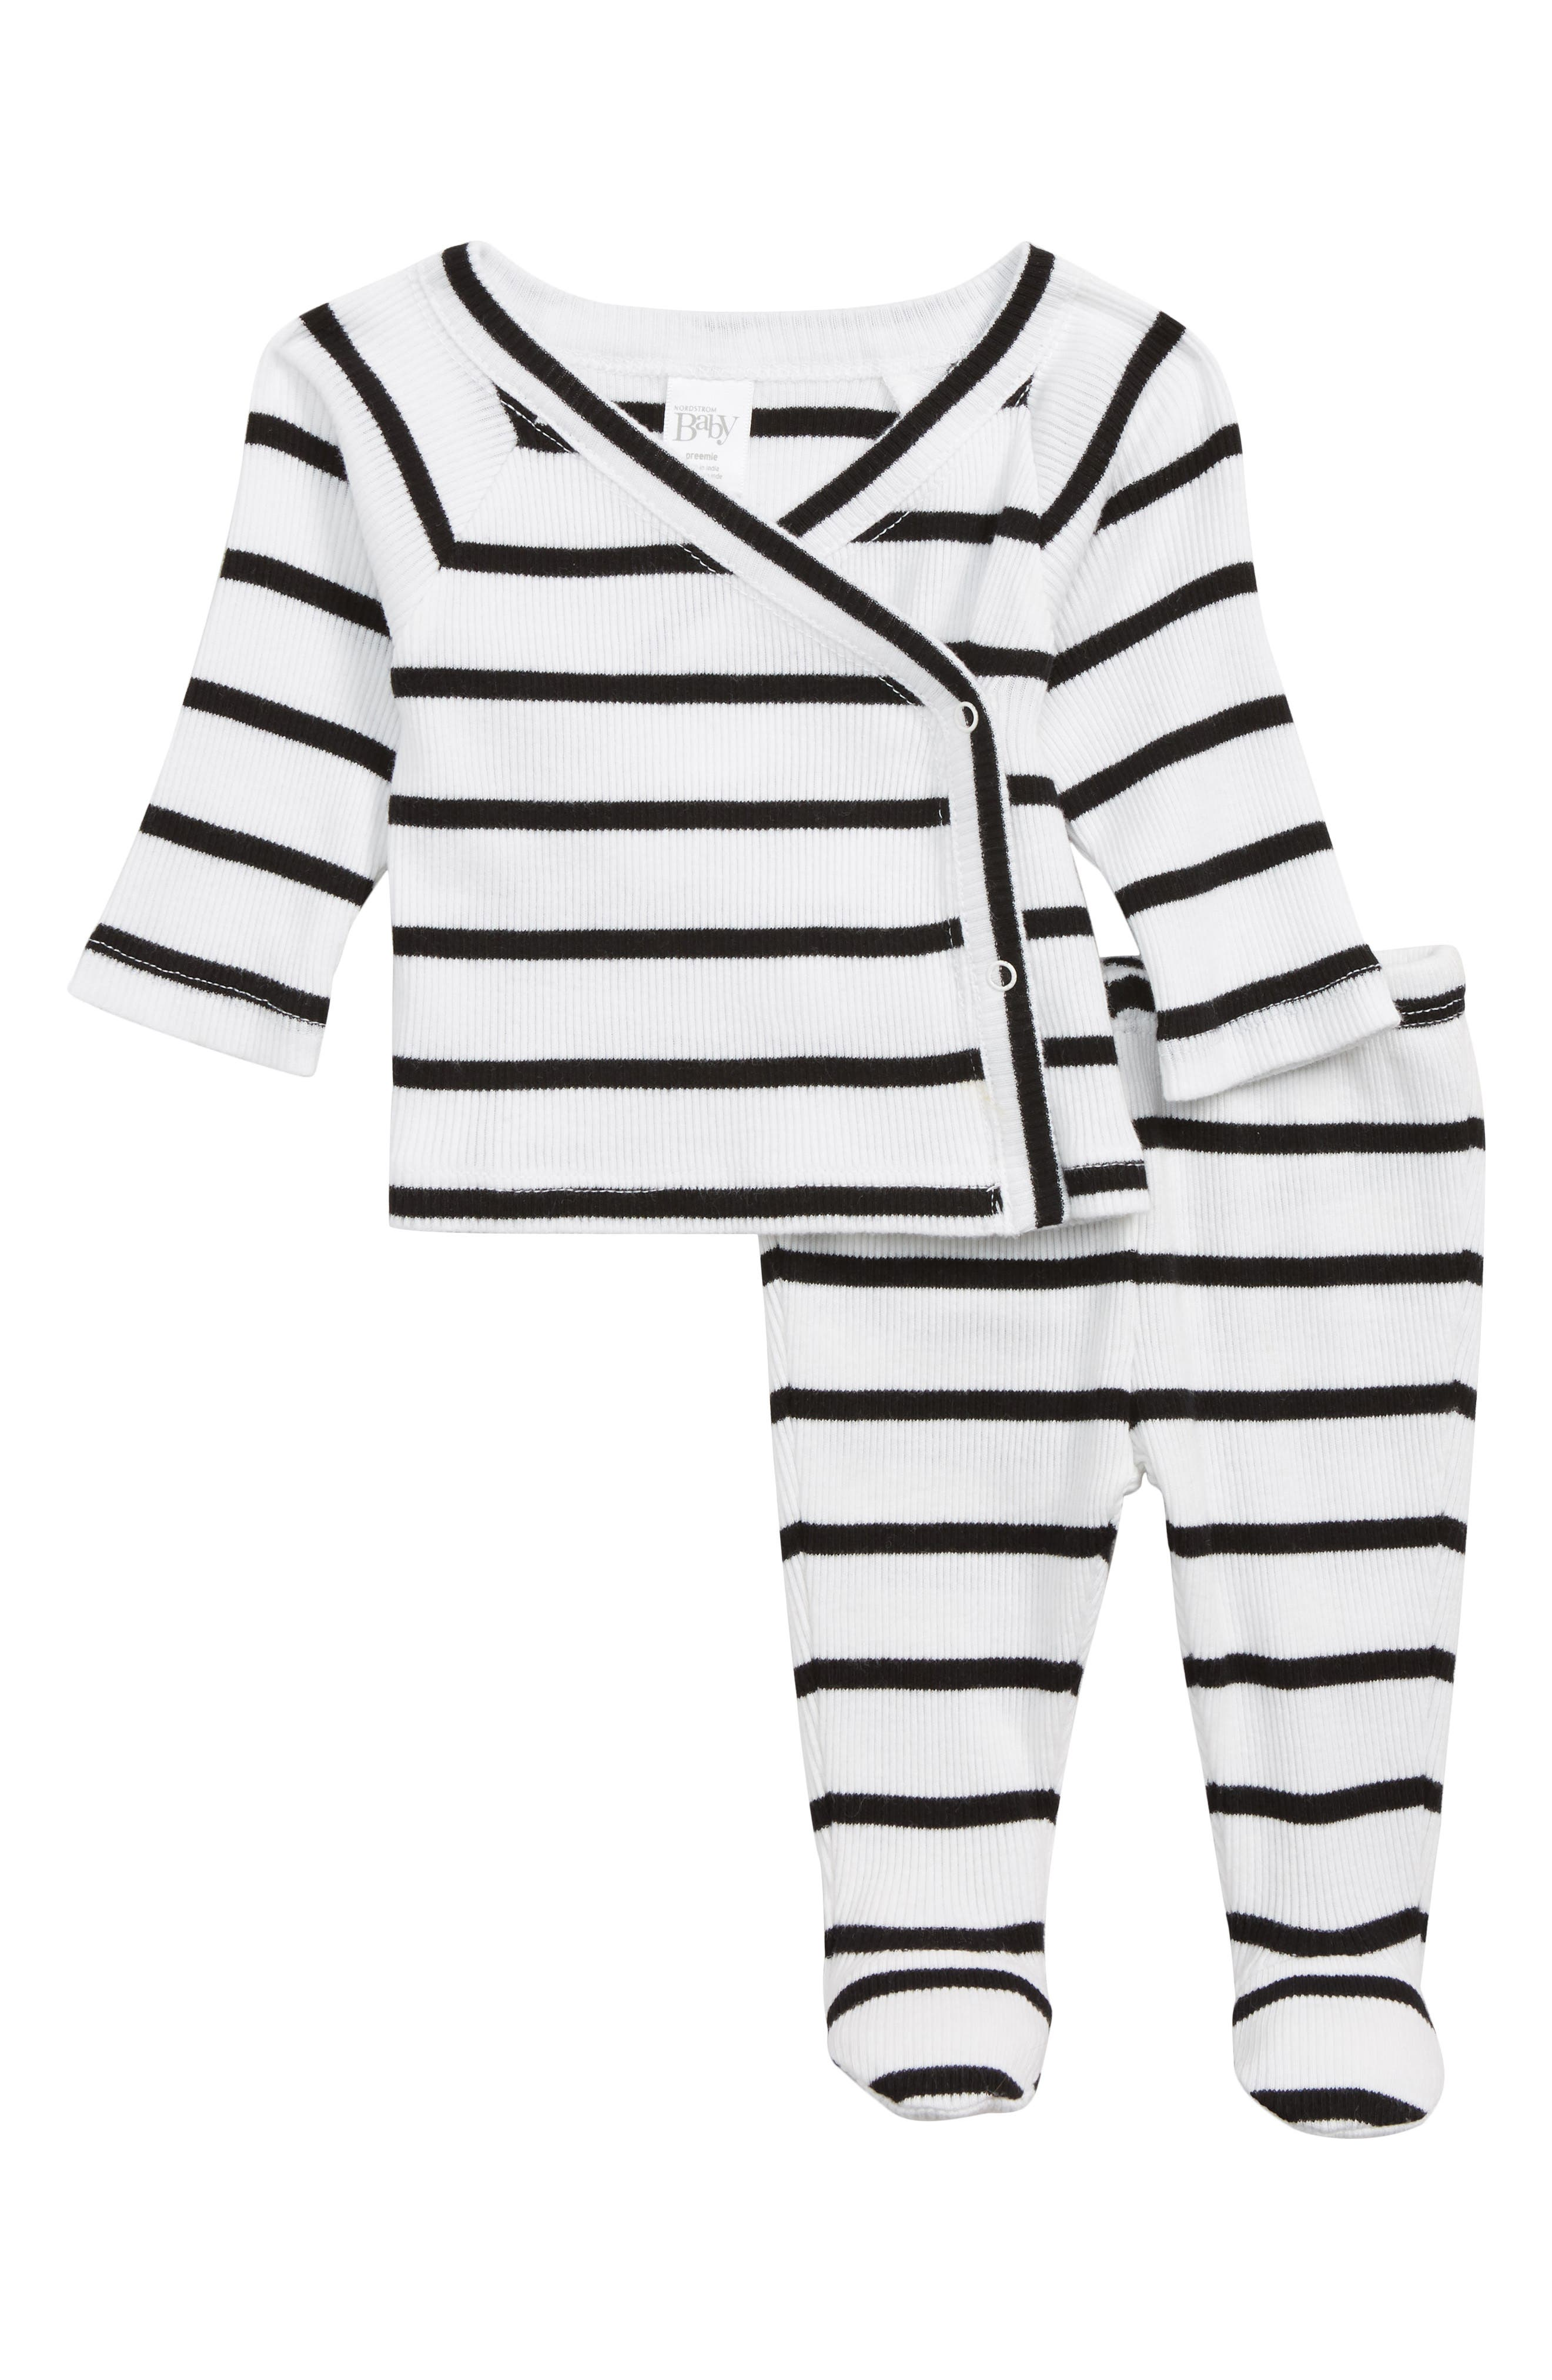 Wrap Top & Footed Pants Set,                             Main thumbnail 1, color,                             WHITE- BLACK BRETON STRIPE